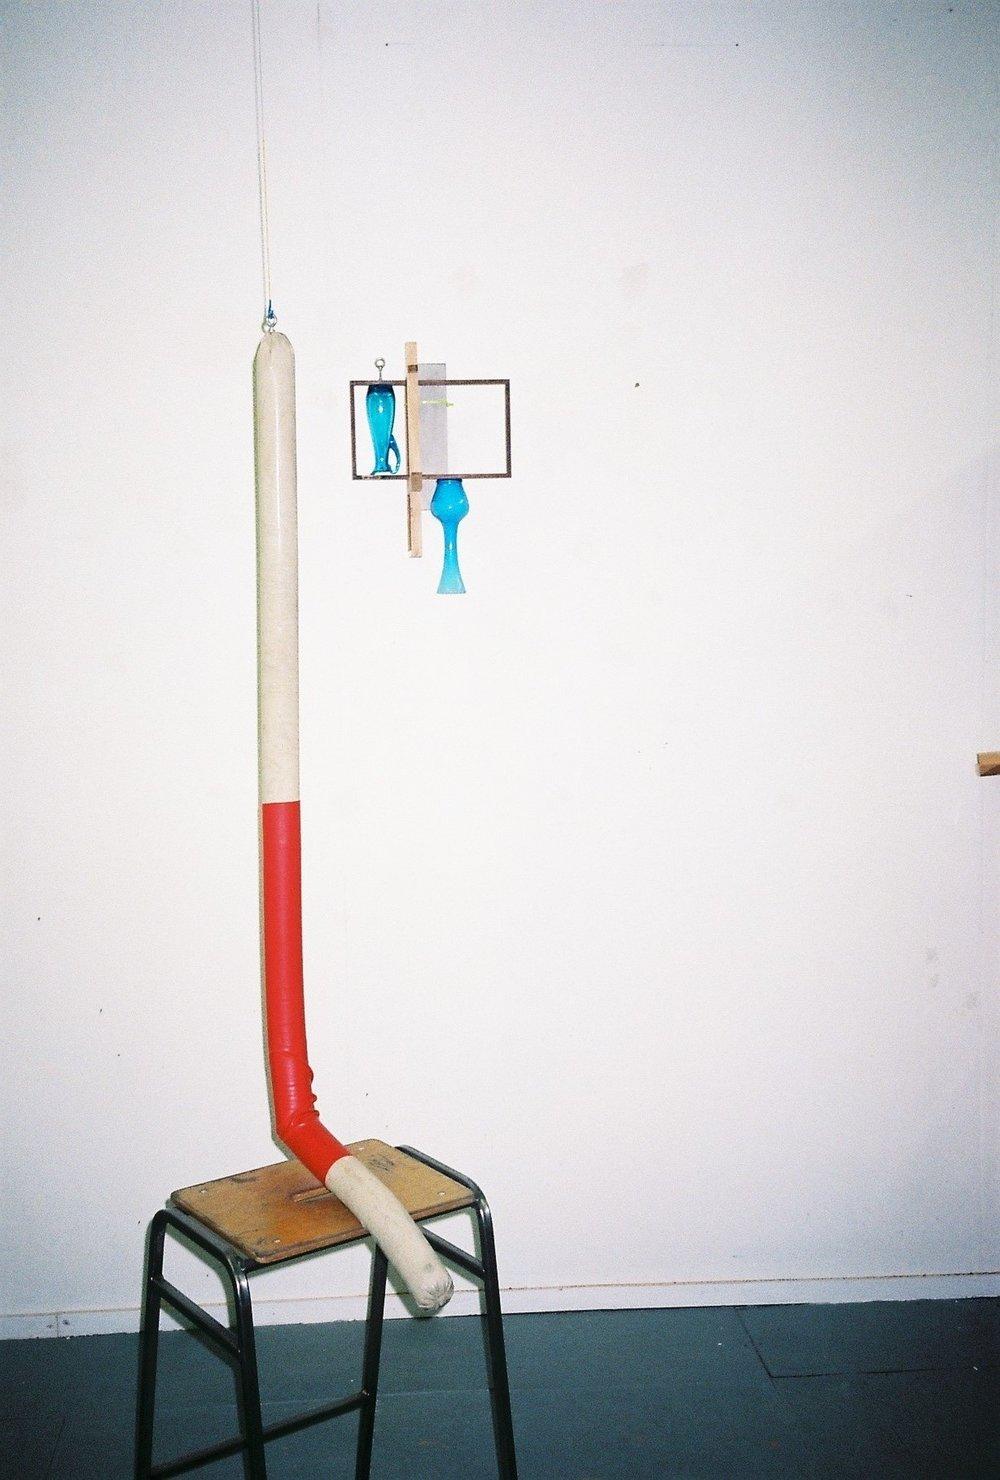 Michael Samuels,Spent, 2016, cast concrete sausage, heat-shrink , vintage stool (left) and Words Fail, 2017,ercol, cast concrete, scandinavian glass vases, cable ties (right)  Photography by Delilah Olson -